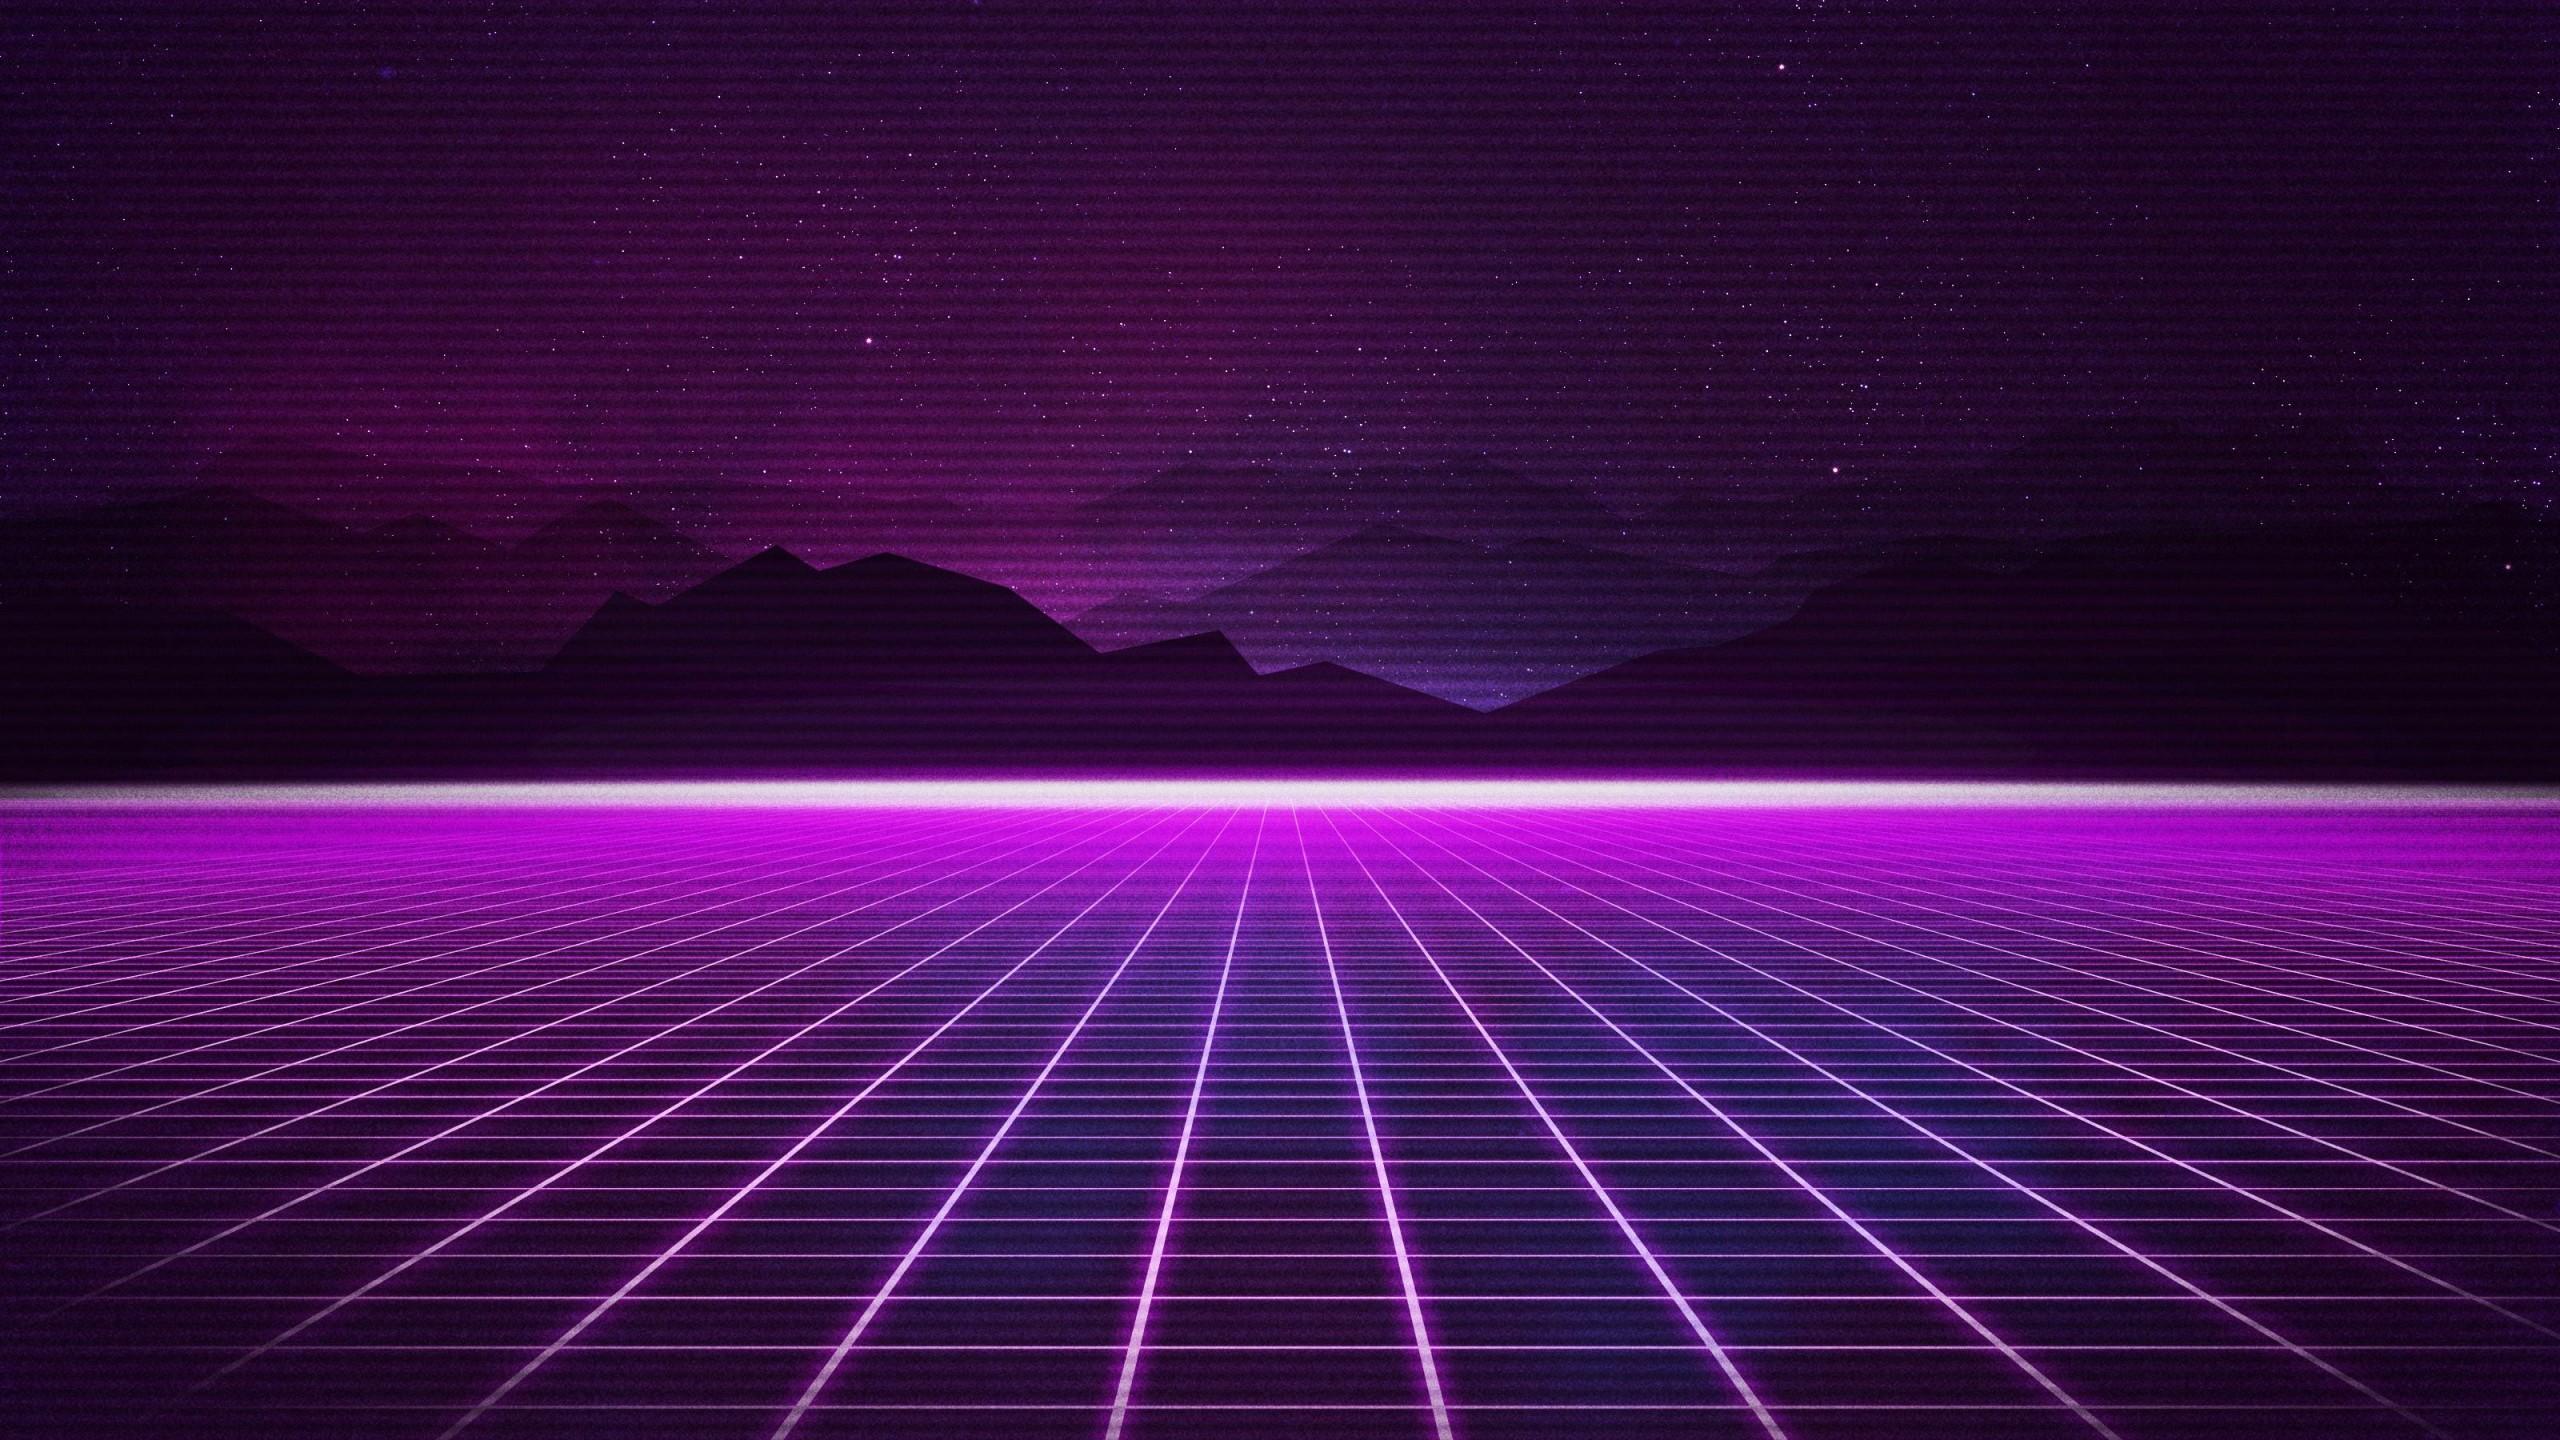 Cute Wallpapers In Full Hd Retrowave Neon Grids Wallpapers Hd Wallpapers Id 28470